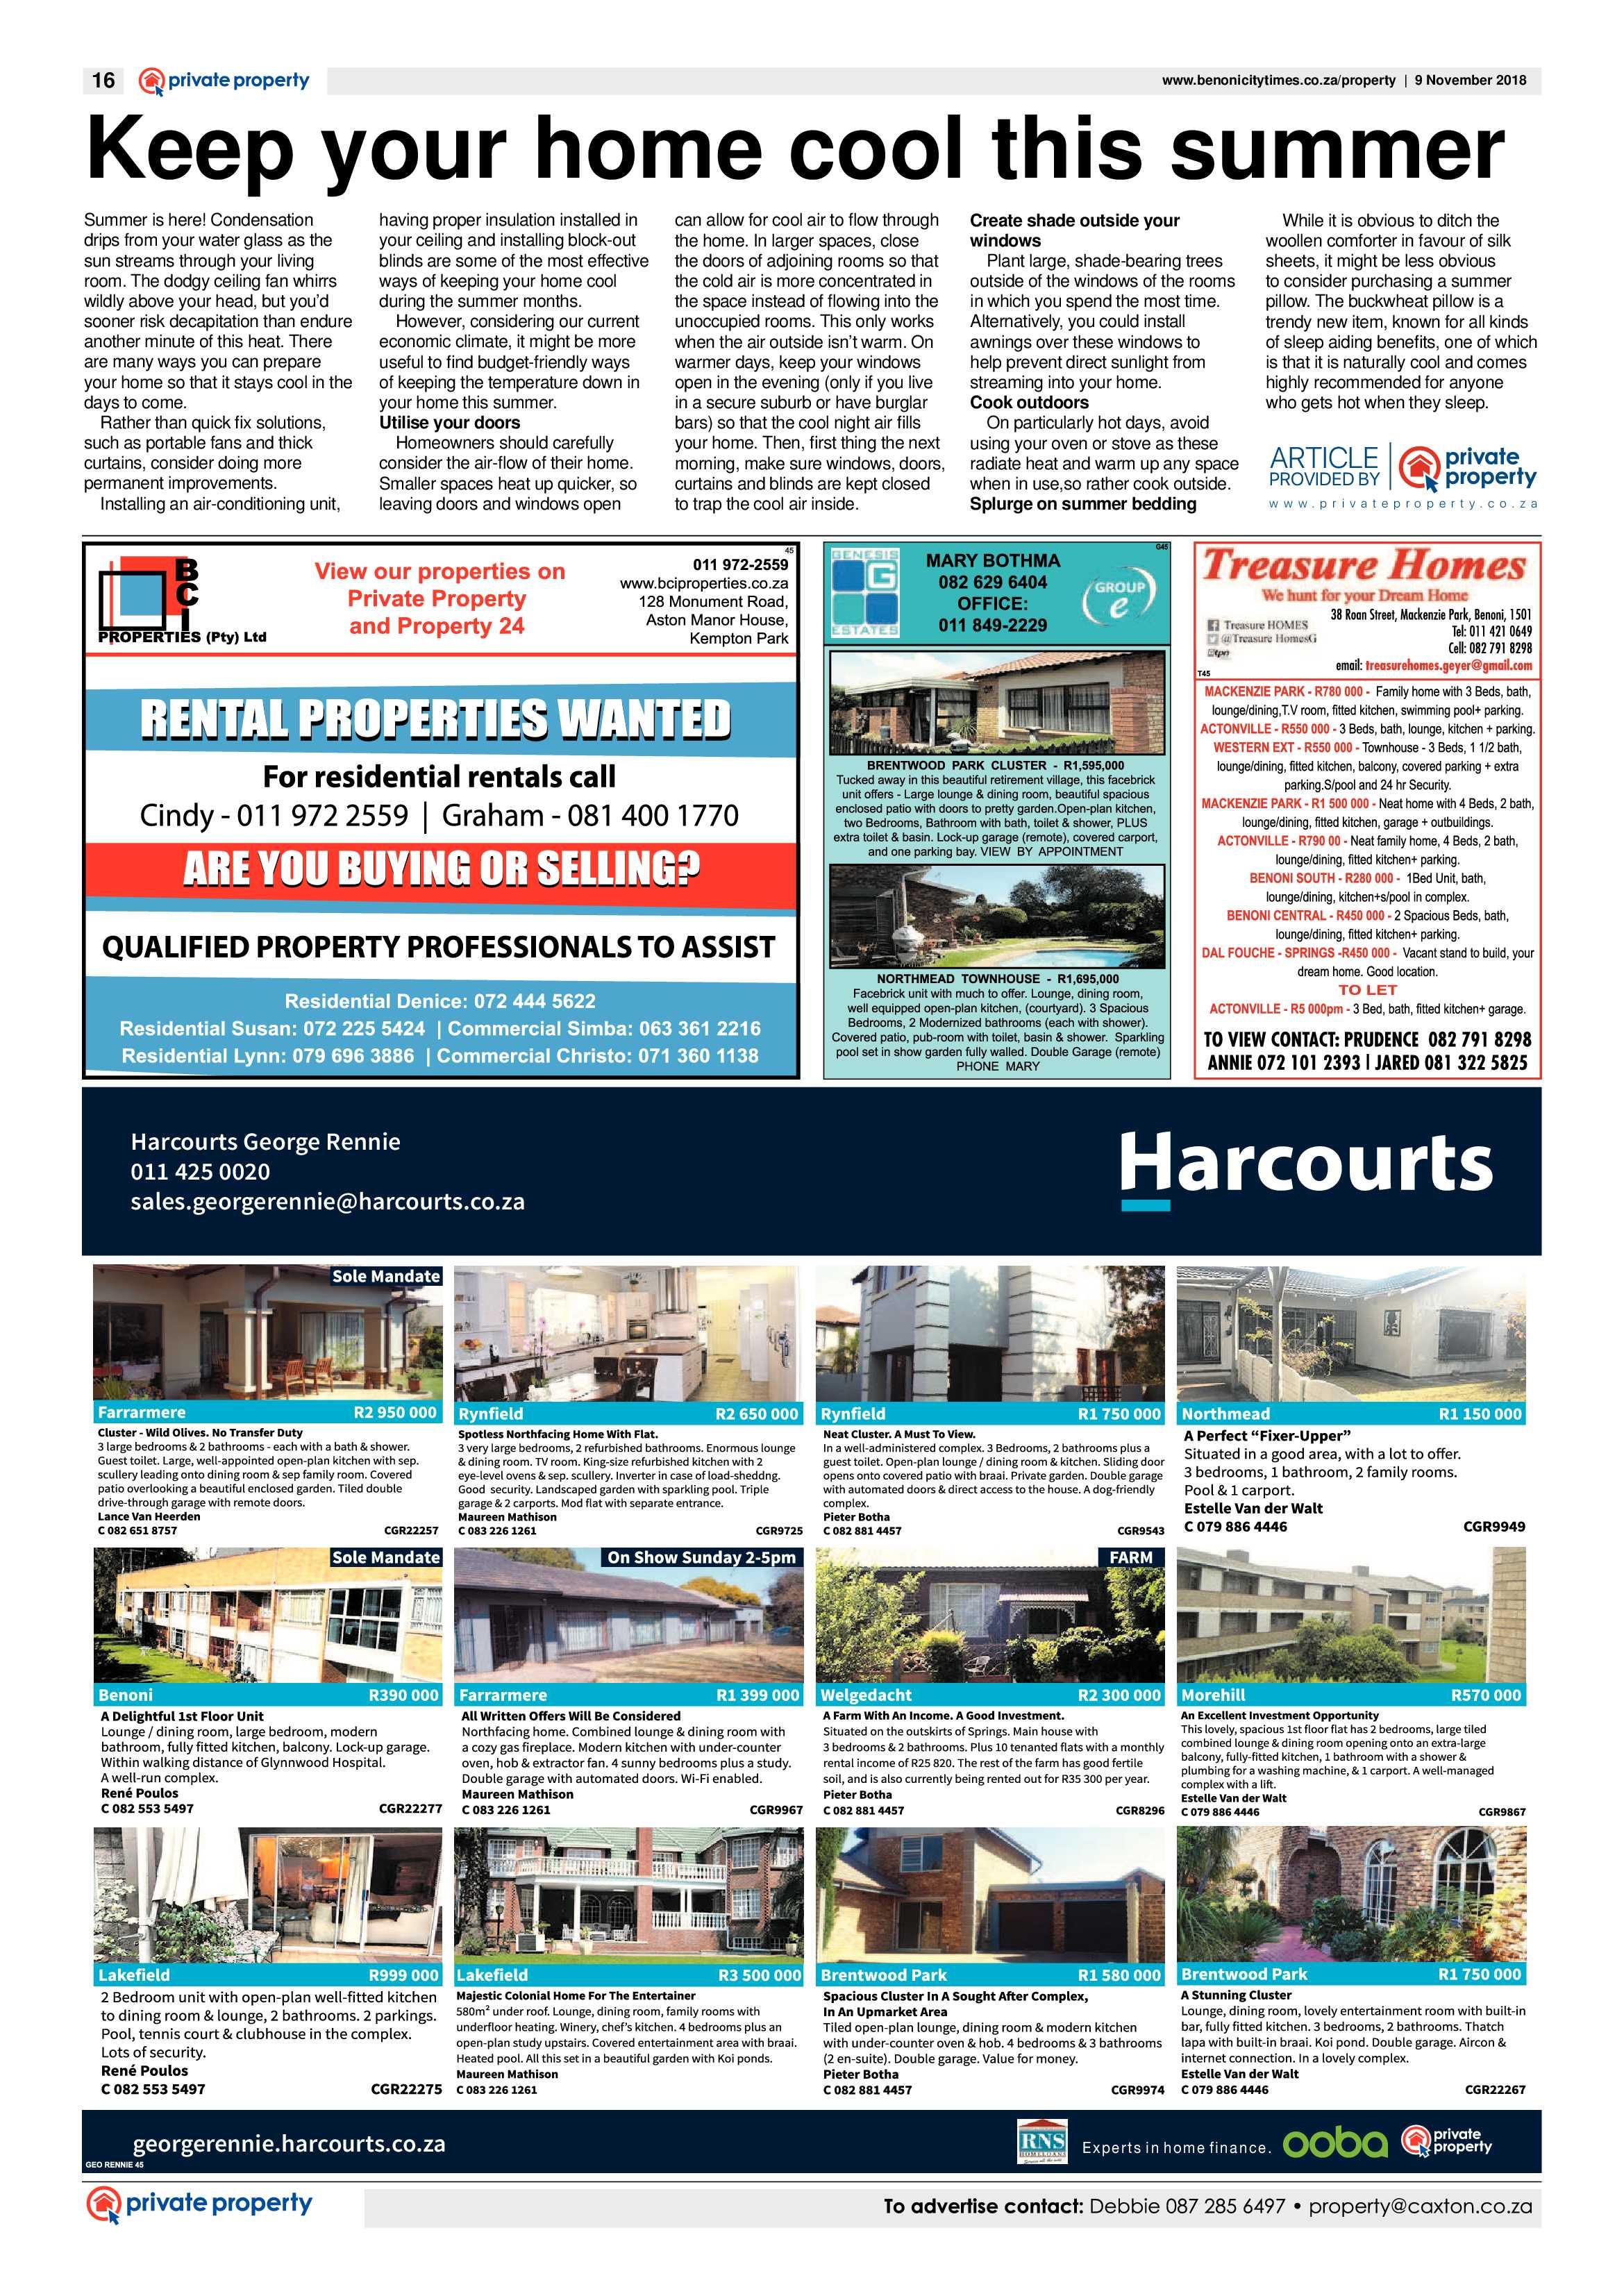 benoni-city-times-08-november-2018-epapers-page-16